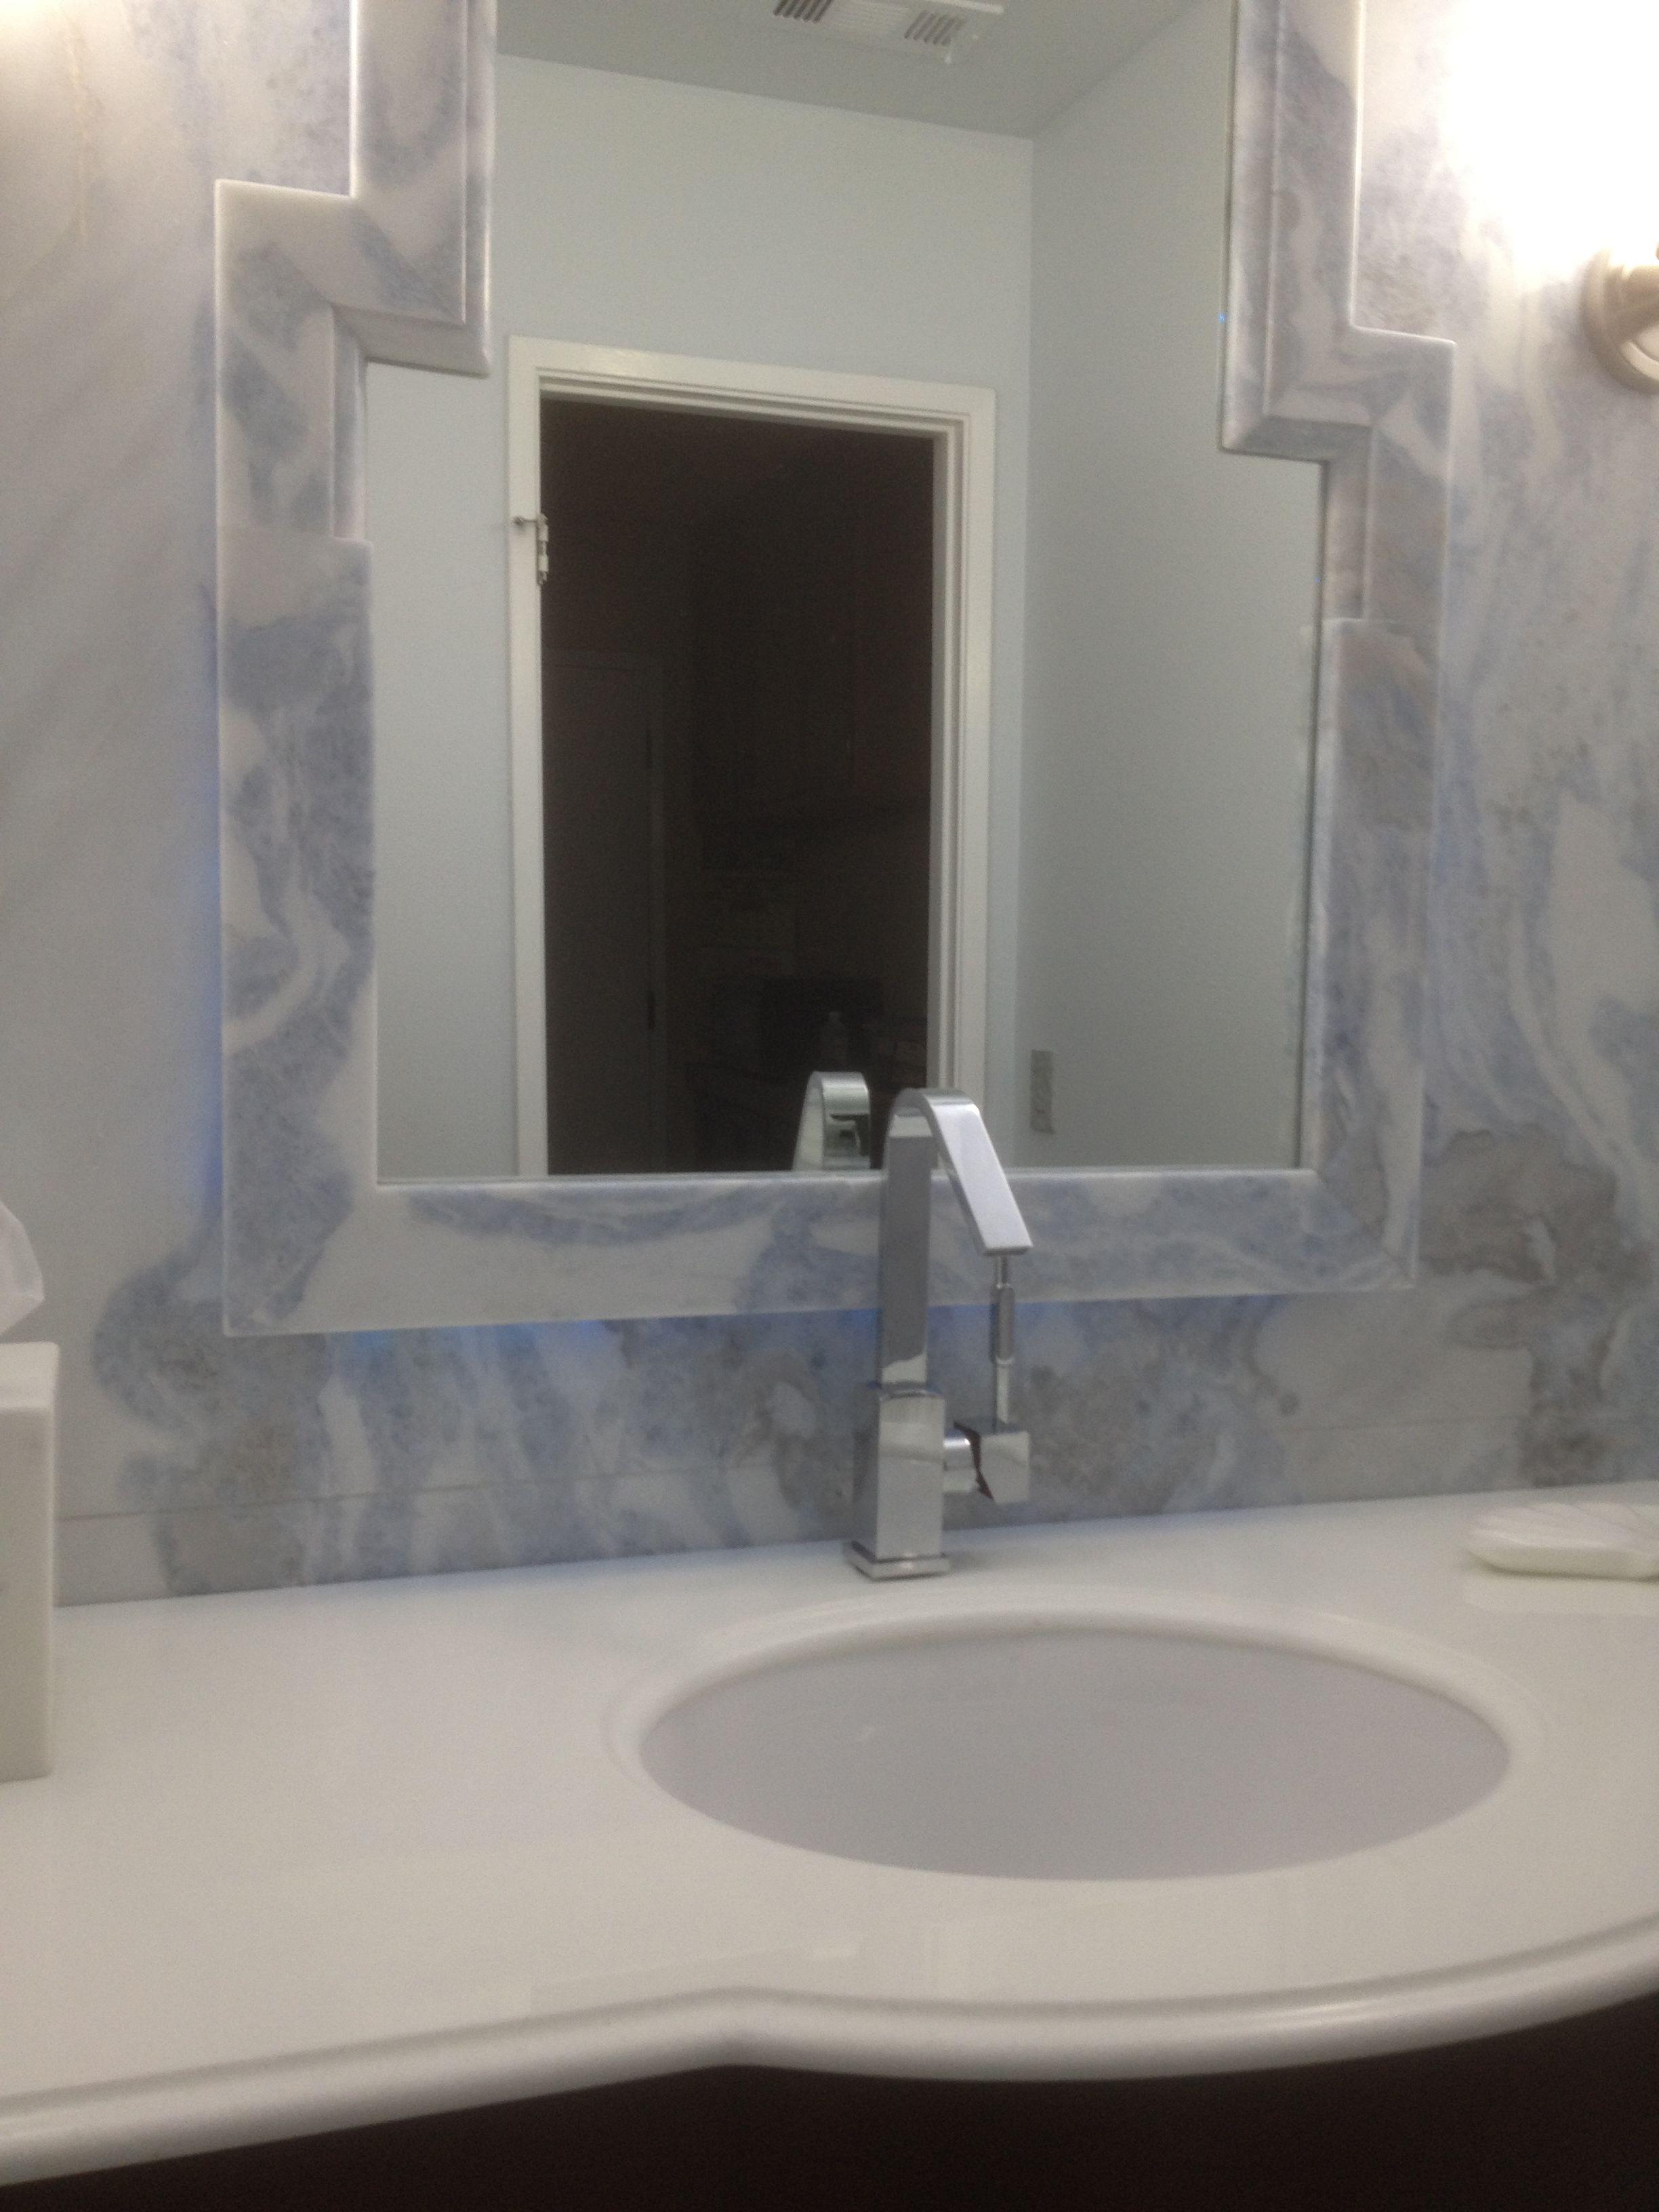 marble mirror frame bathroom remodel ideas pinterest